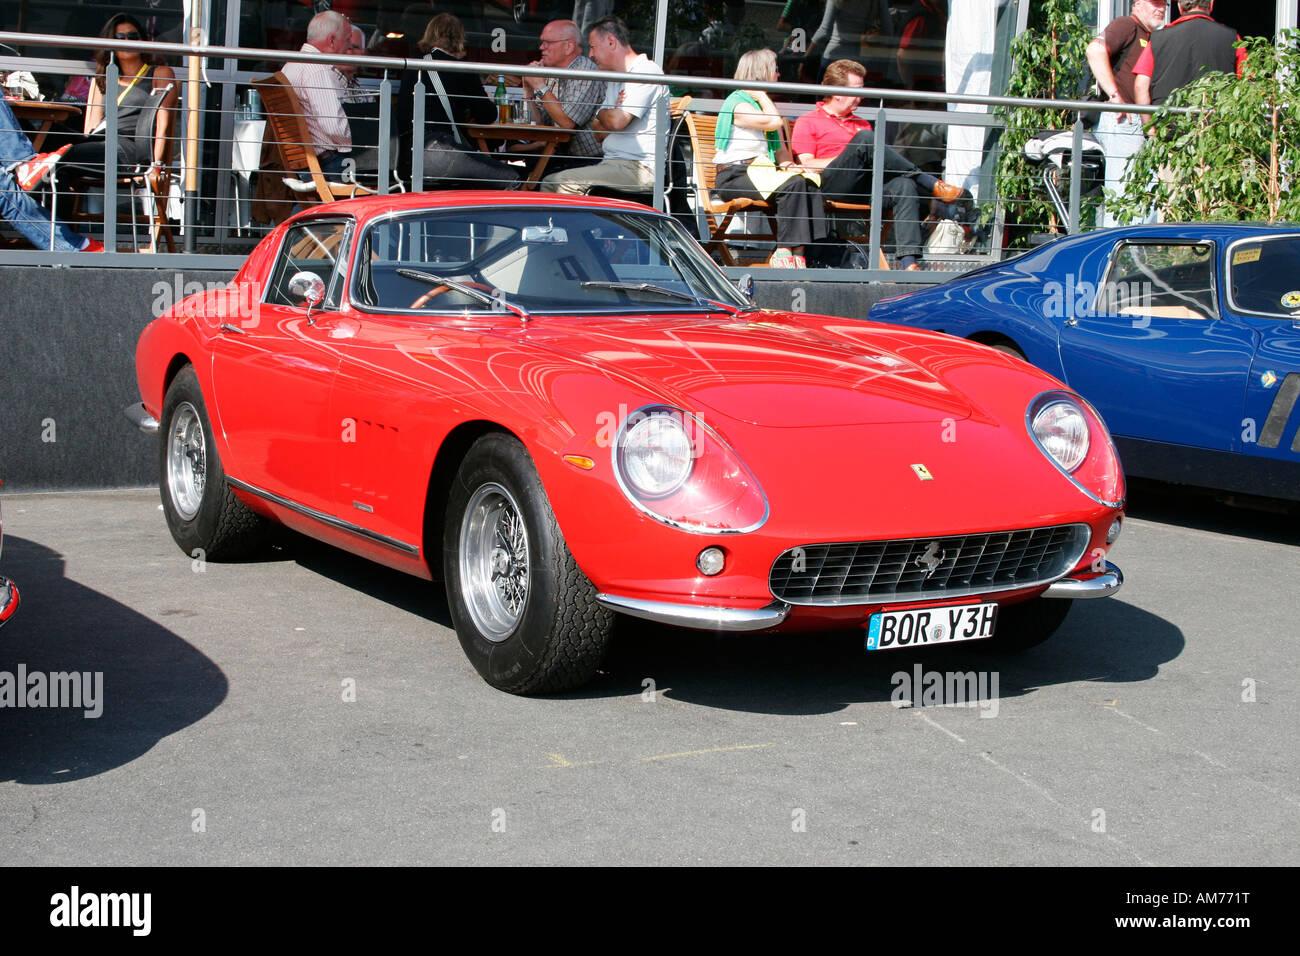 Vintage Ferrari Grand Prix